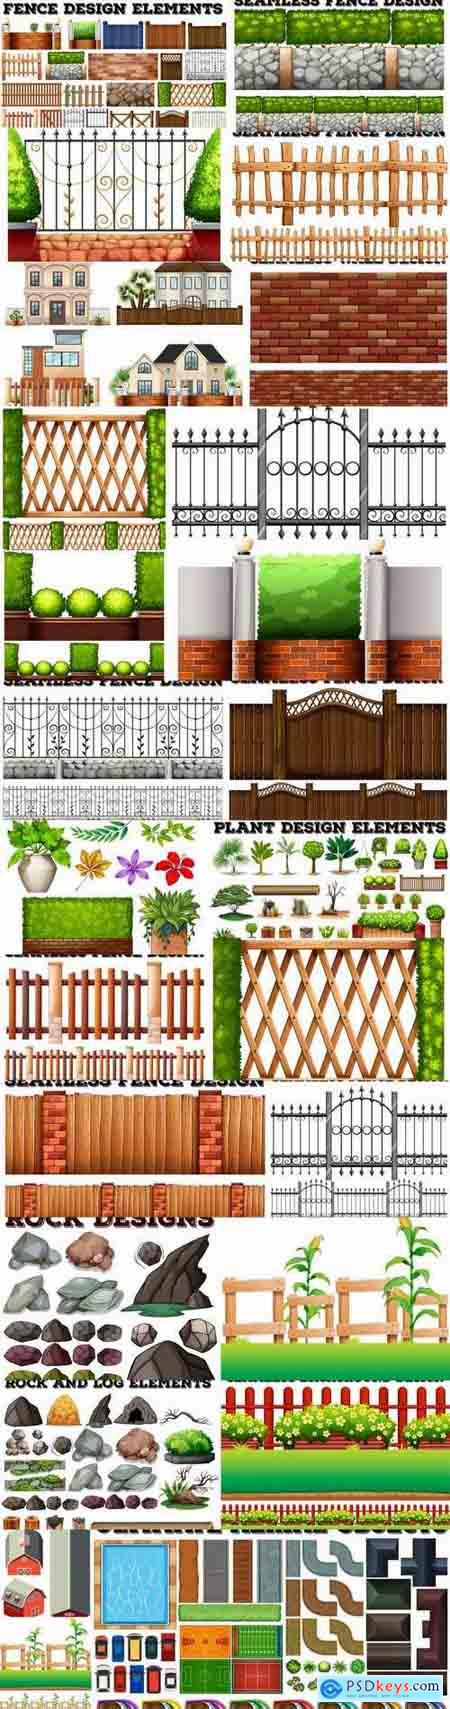 Landscape design element decoration fence stone fence gate house 25 EPS